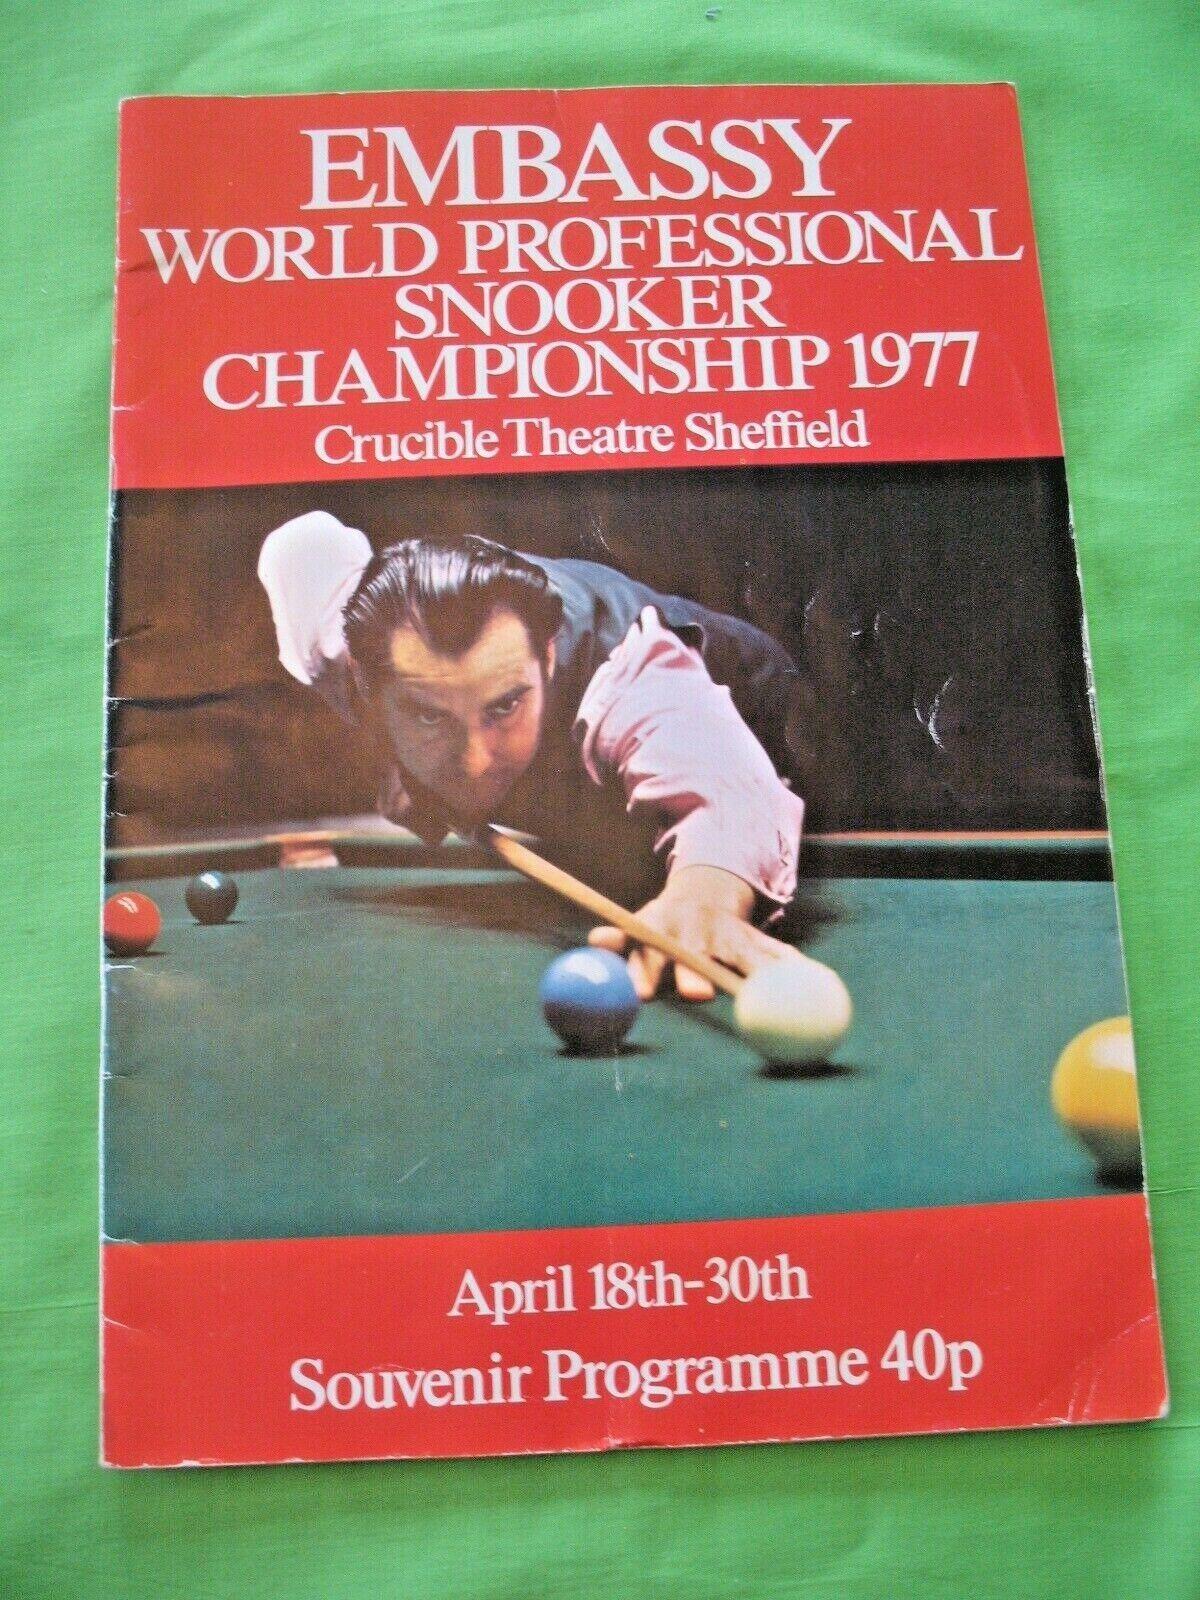 Rare old vintage 1977 EMBASSY World Professional Snooker Championship Programme